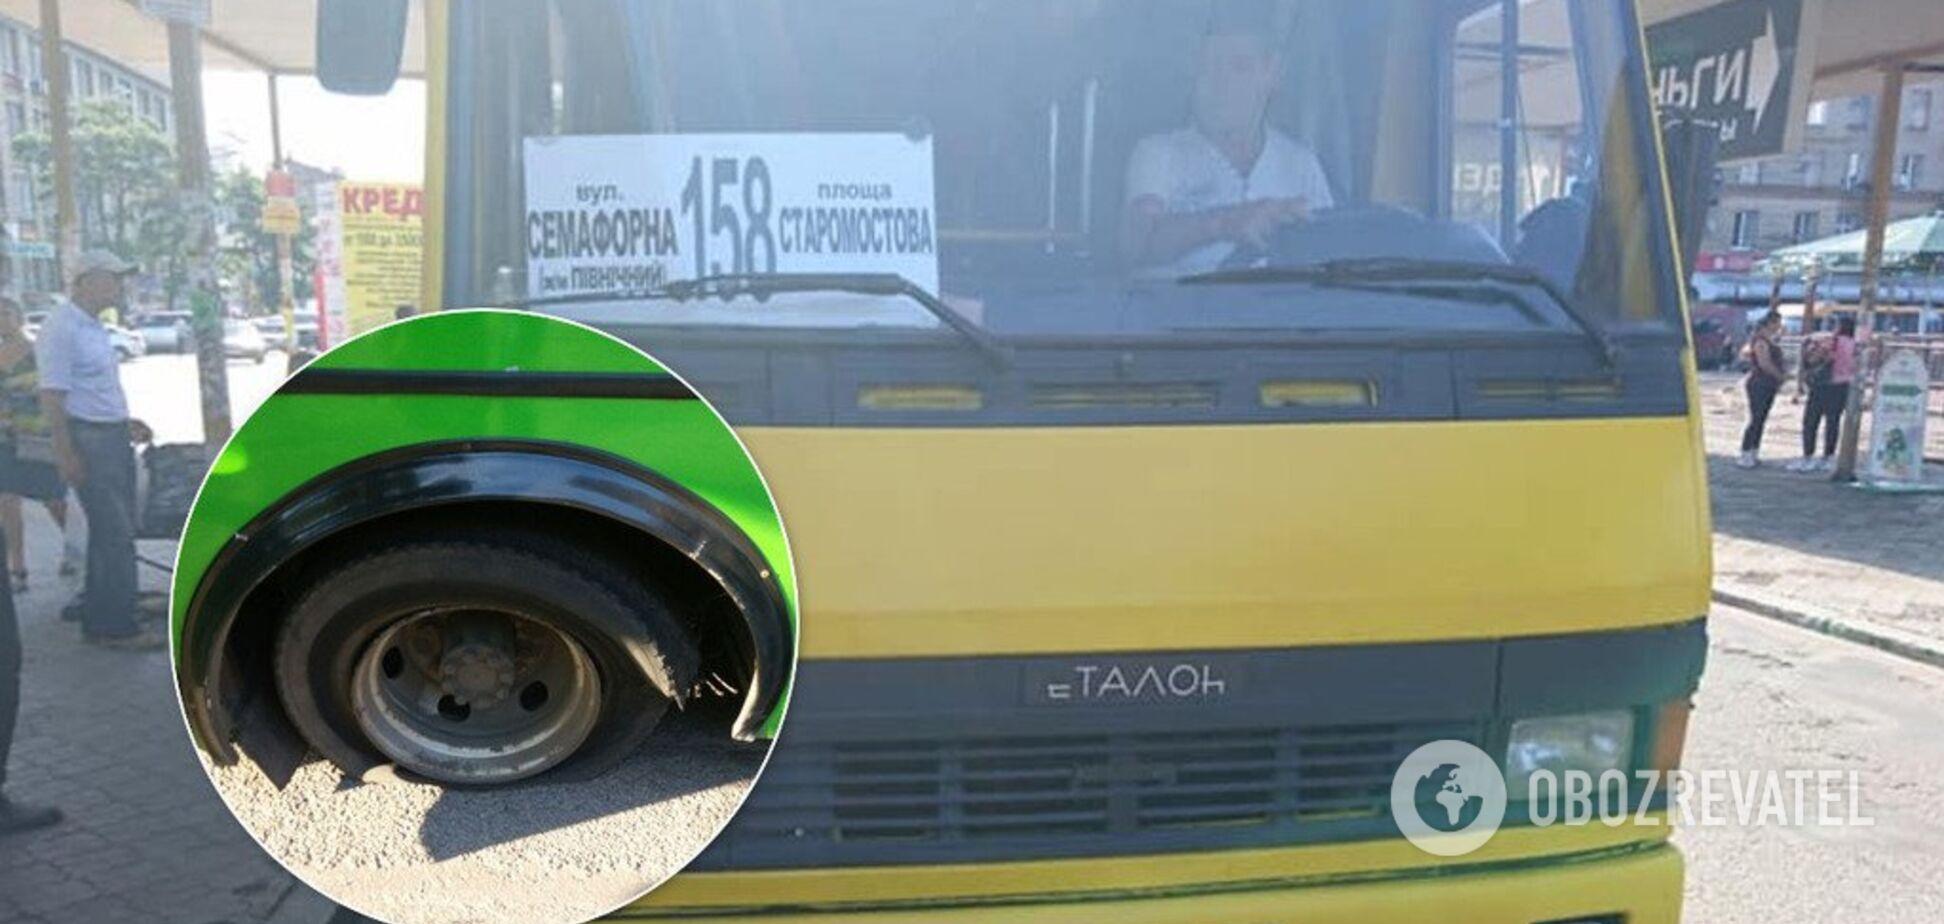 В Днепре на ходу у маршрутки лопнули колеса: фото и подробности